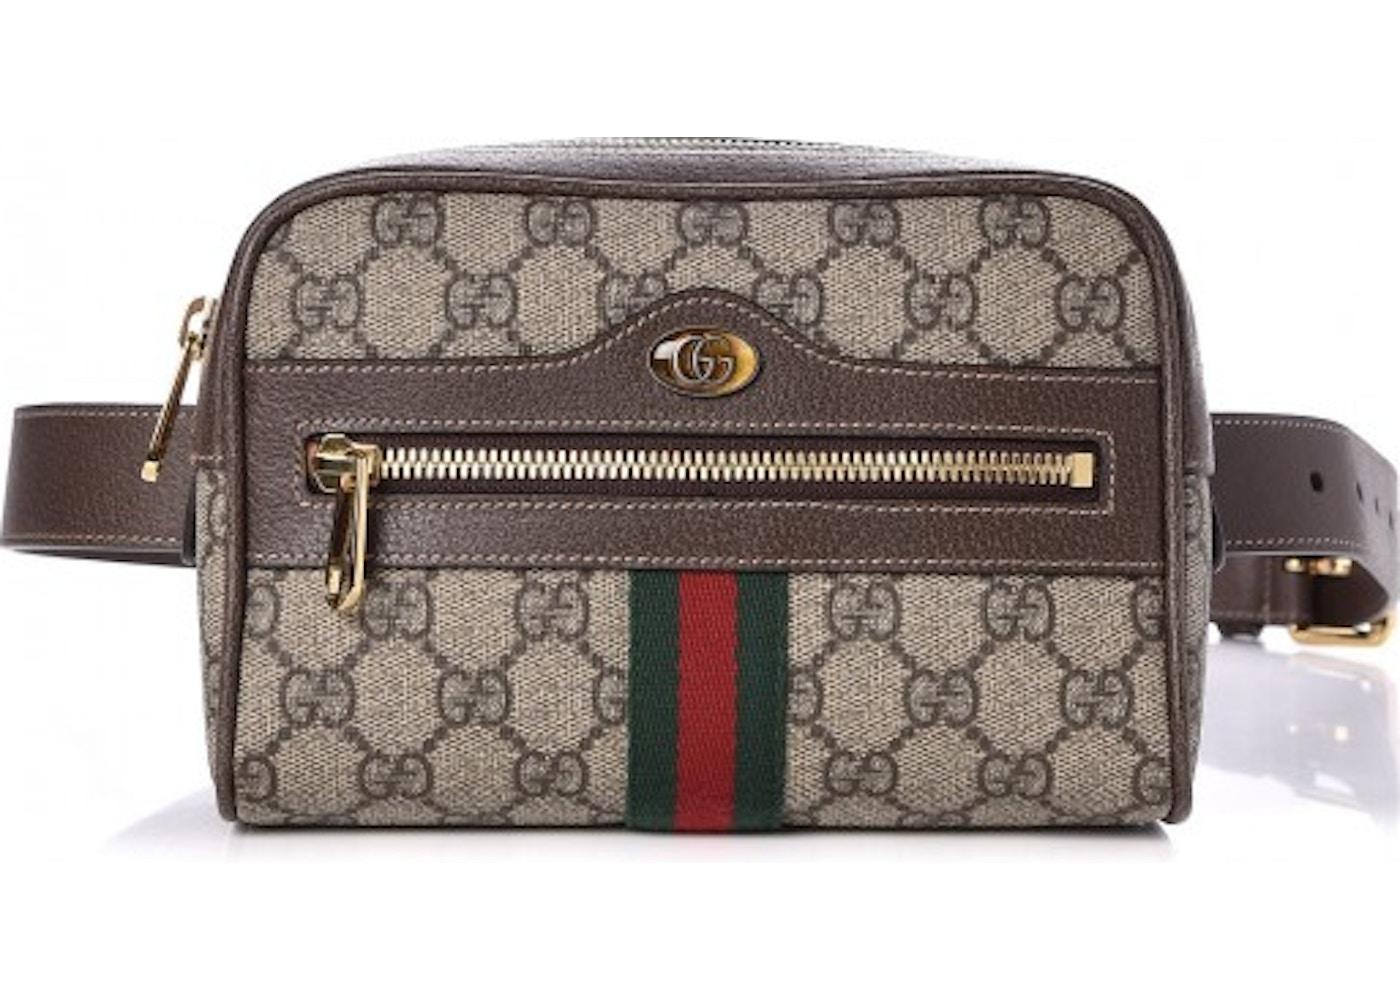 f7cdf3321 Gucci Ophidia Belt Bag Monogram GG Supreme Small Dark Brown